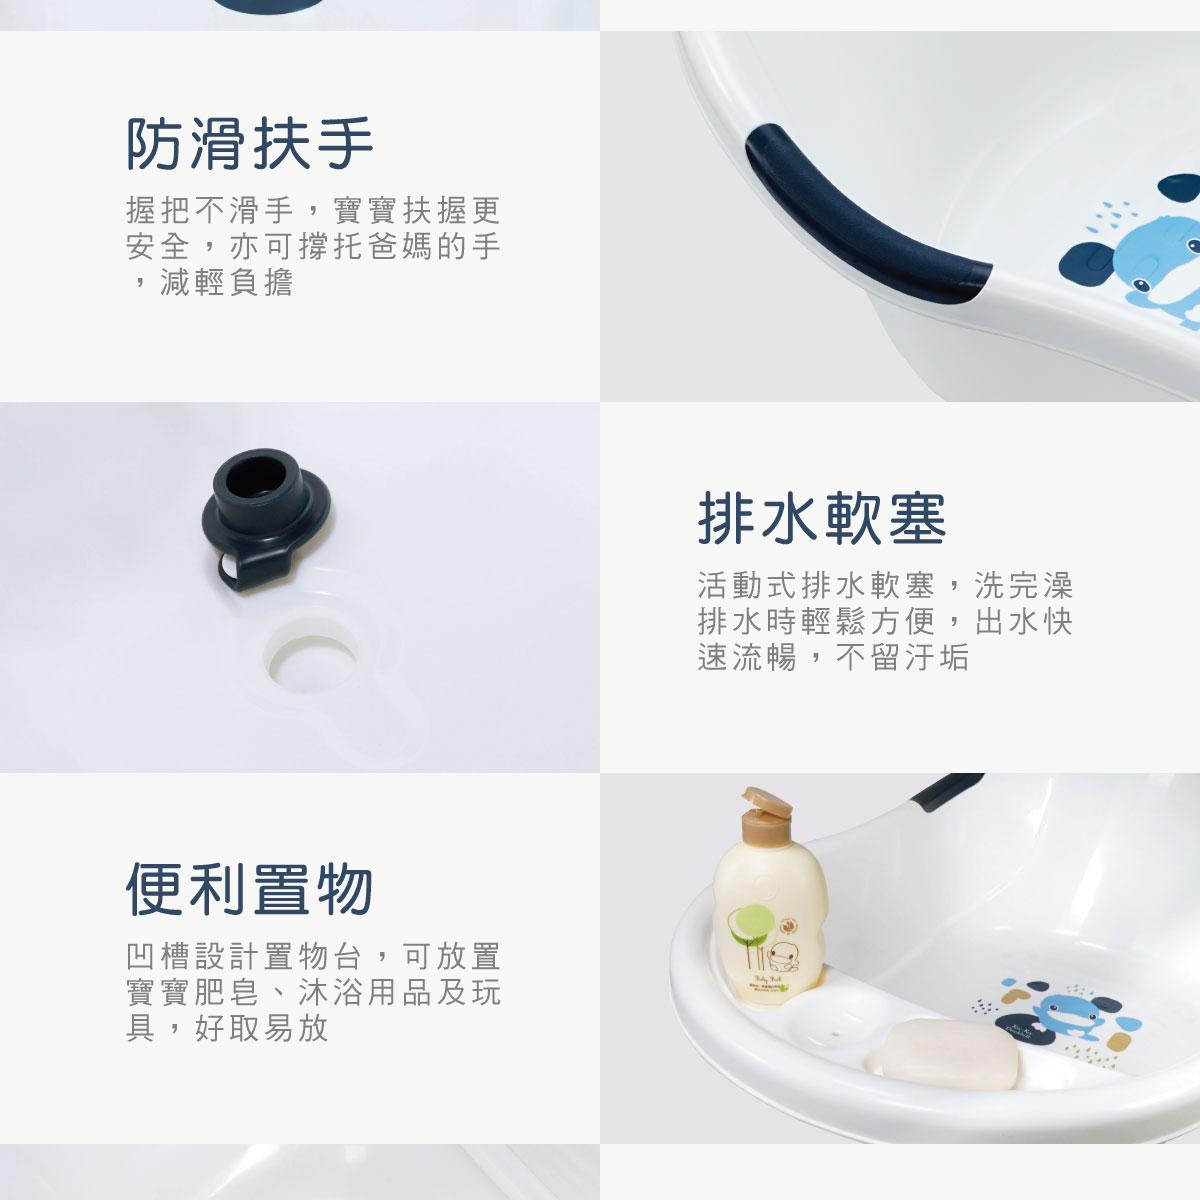 proimages/Bathing&CleanSeries/Bathing/BabyBathTub/1135/1135-成長印記浴盆-EDM-6.jpg